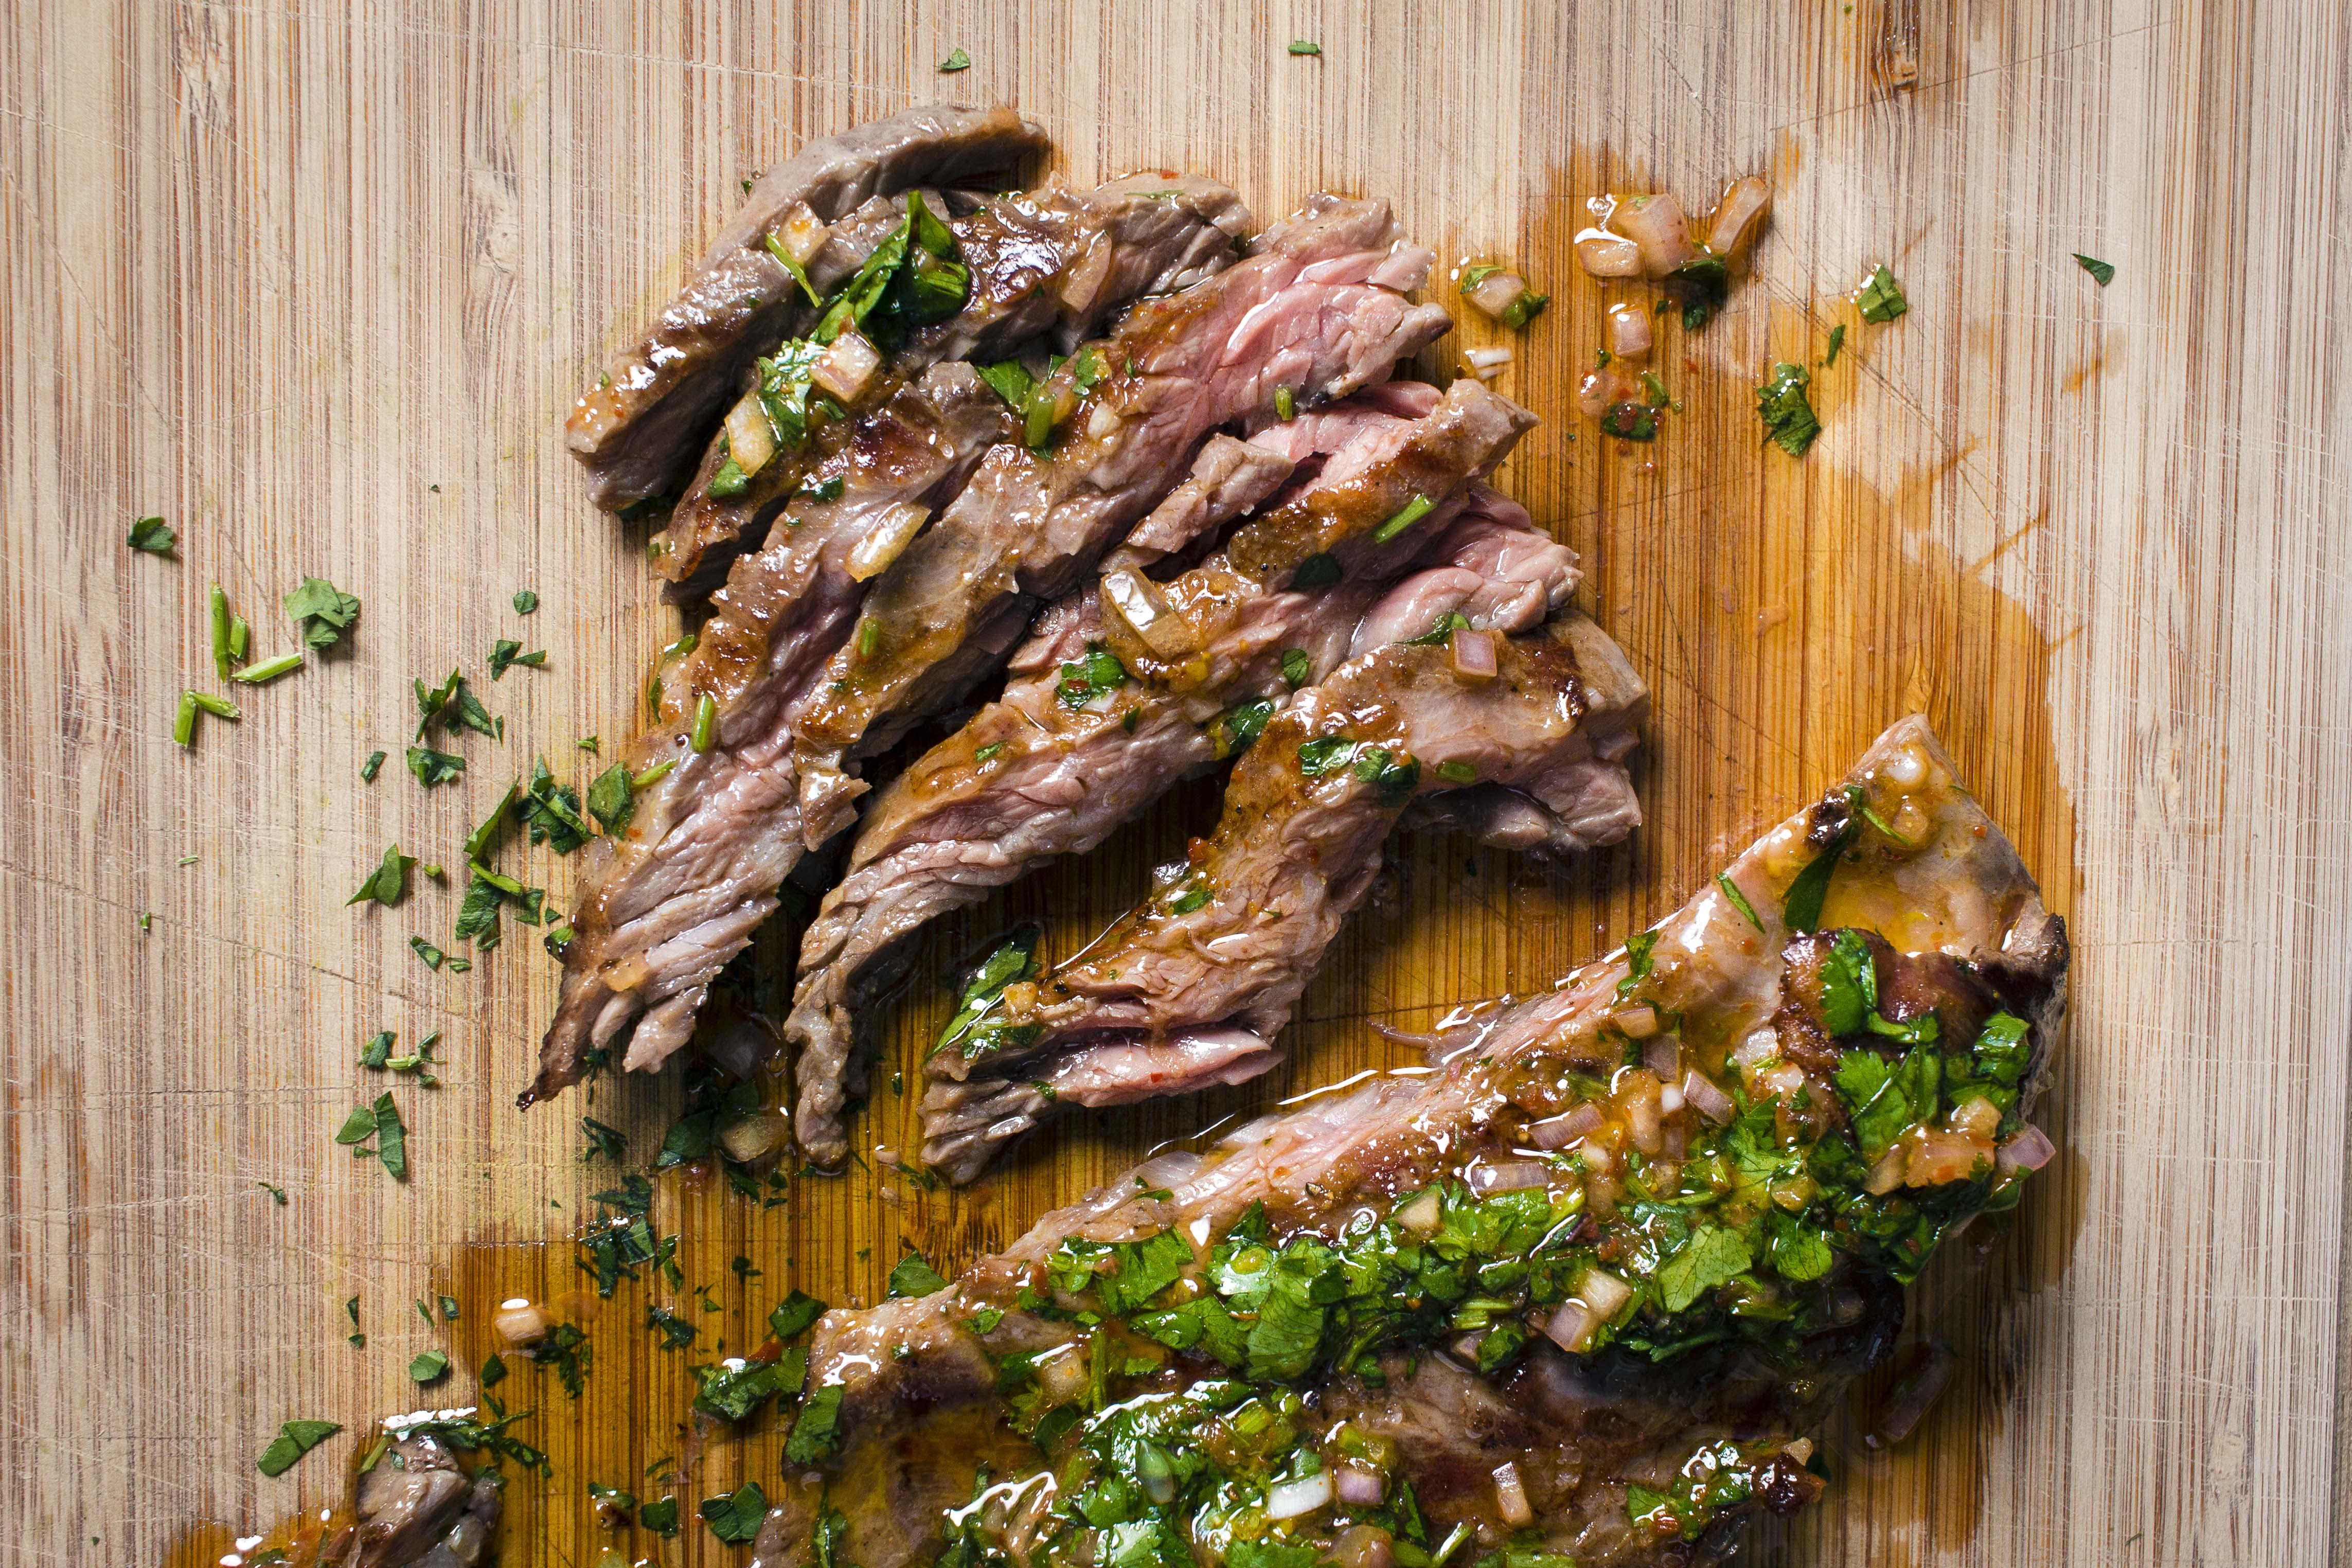 Harissa Chimichurri on Skirt Steak | I Will Not Eat Oysters